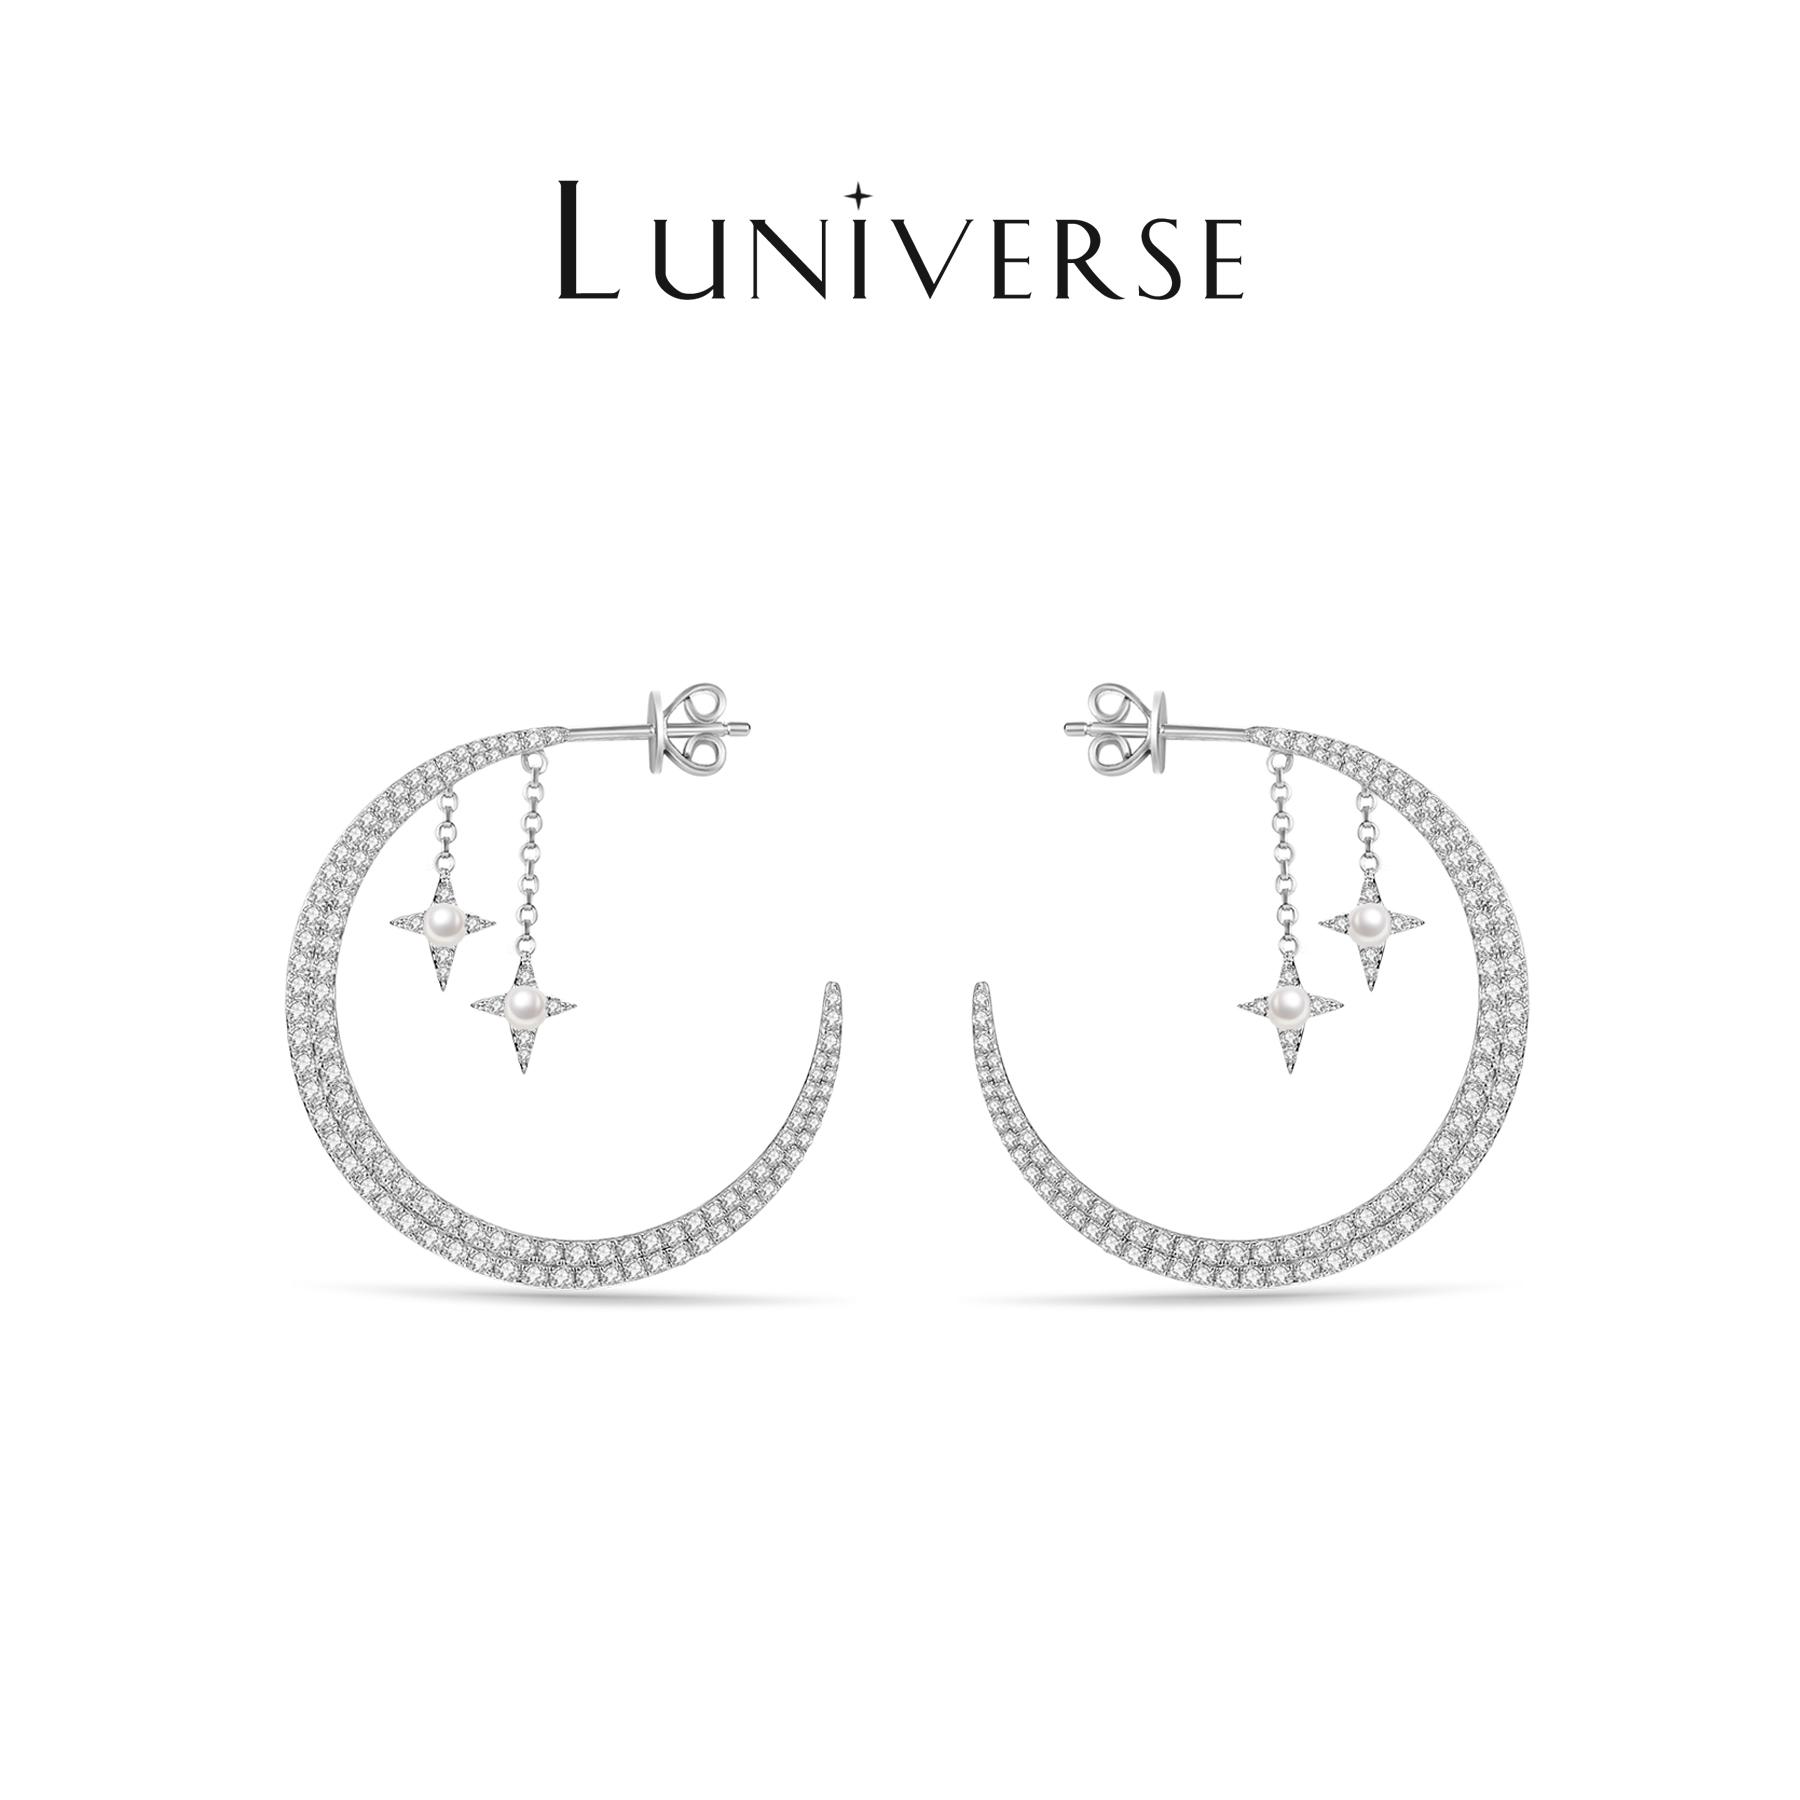 Luniverse 新月之夜 珍珠镶锆石纯银镀18k白金环状耳环